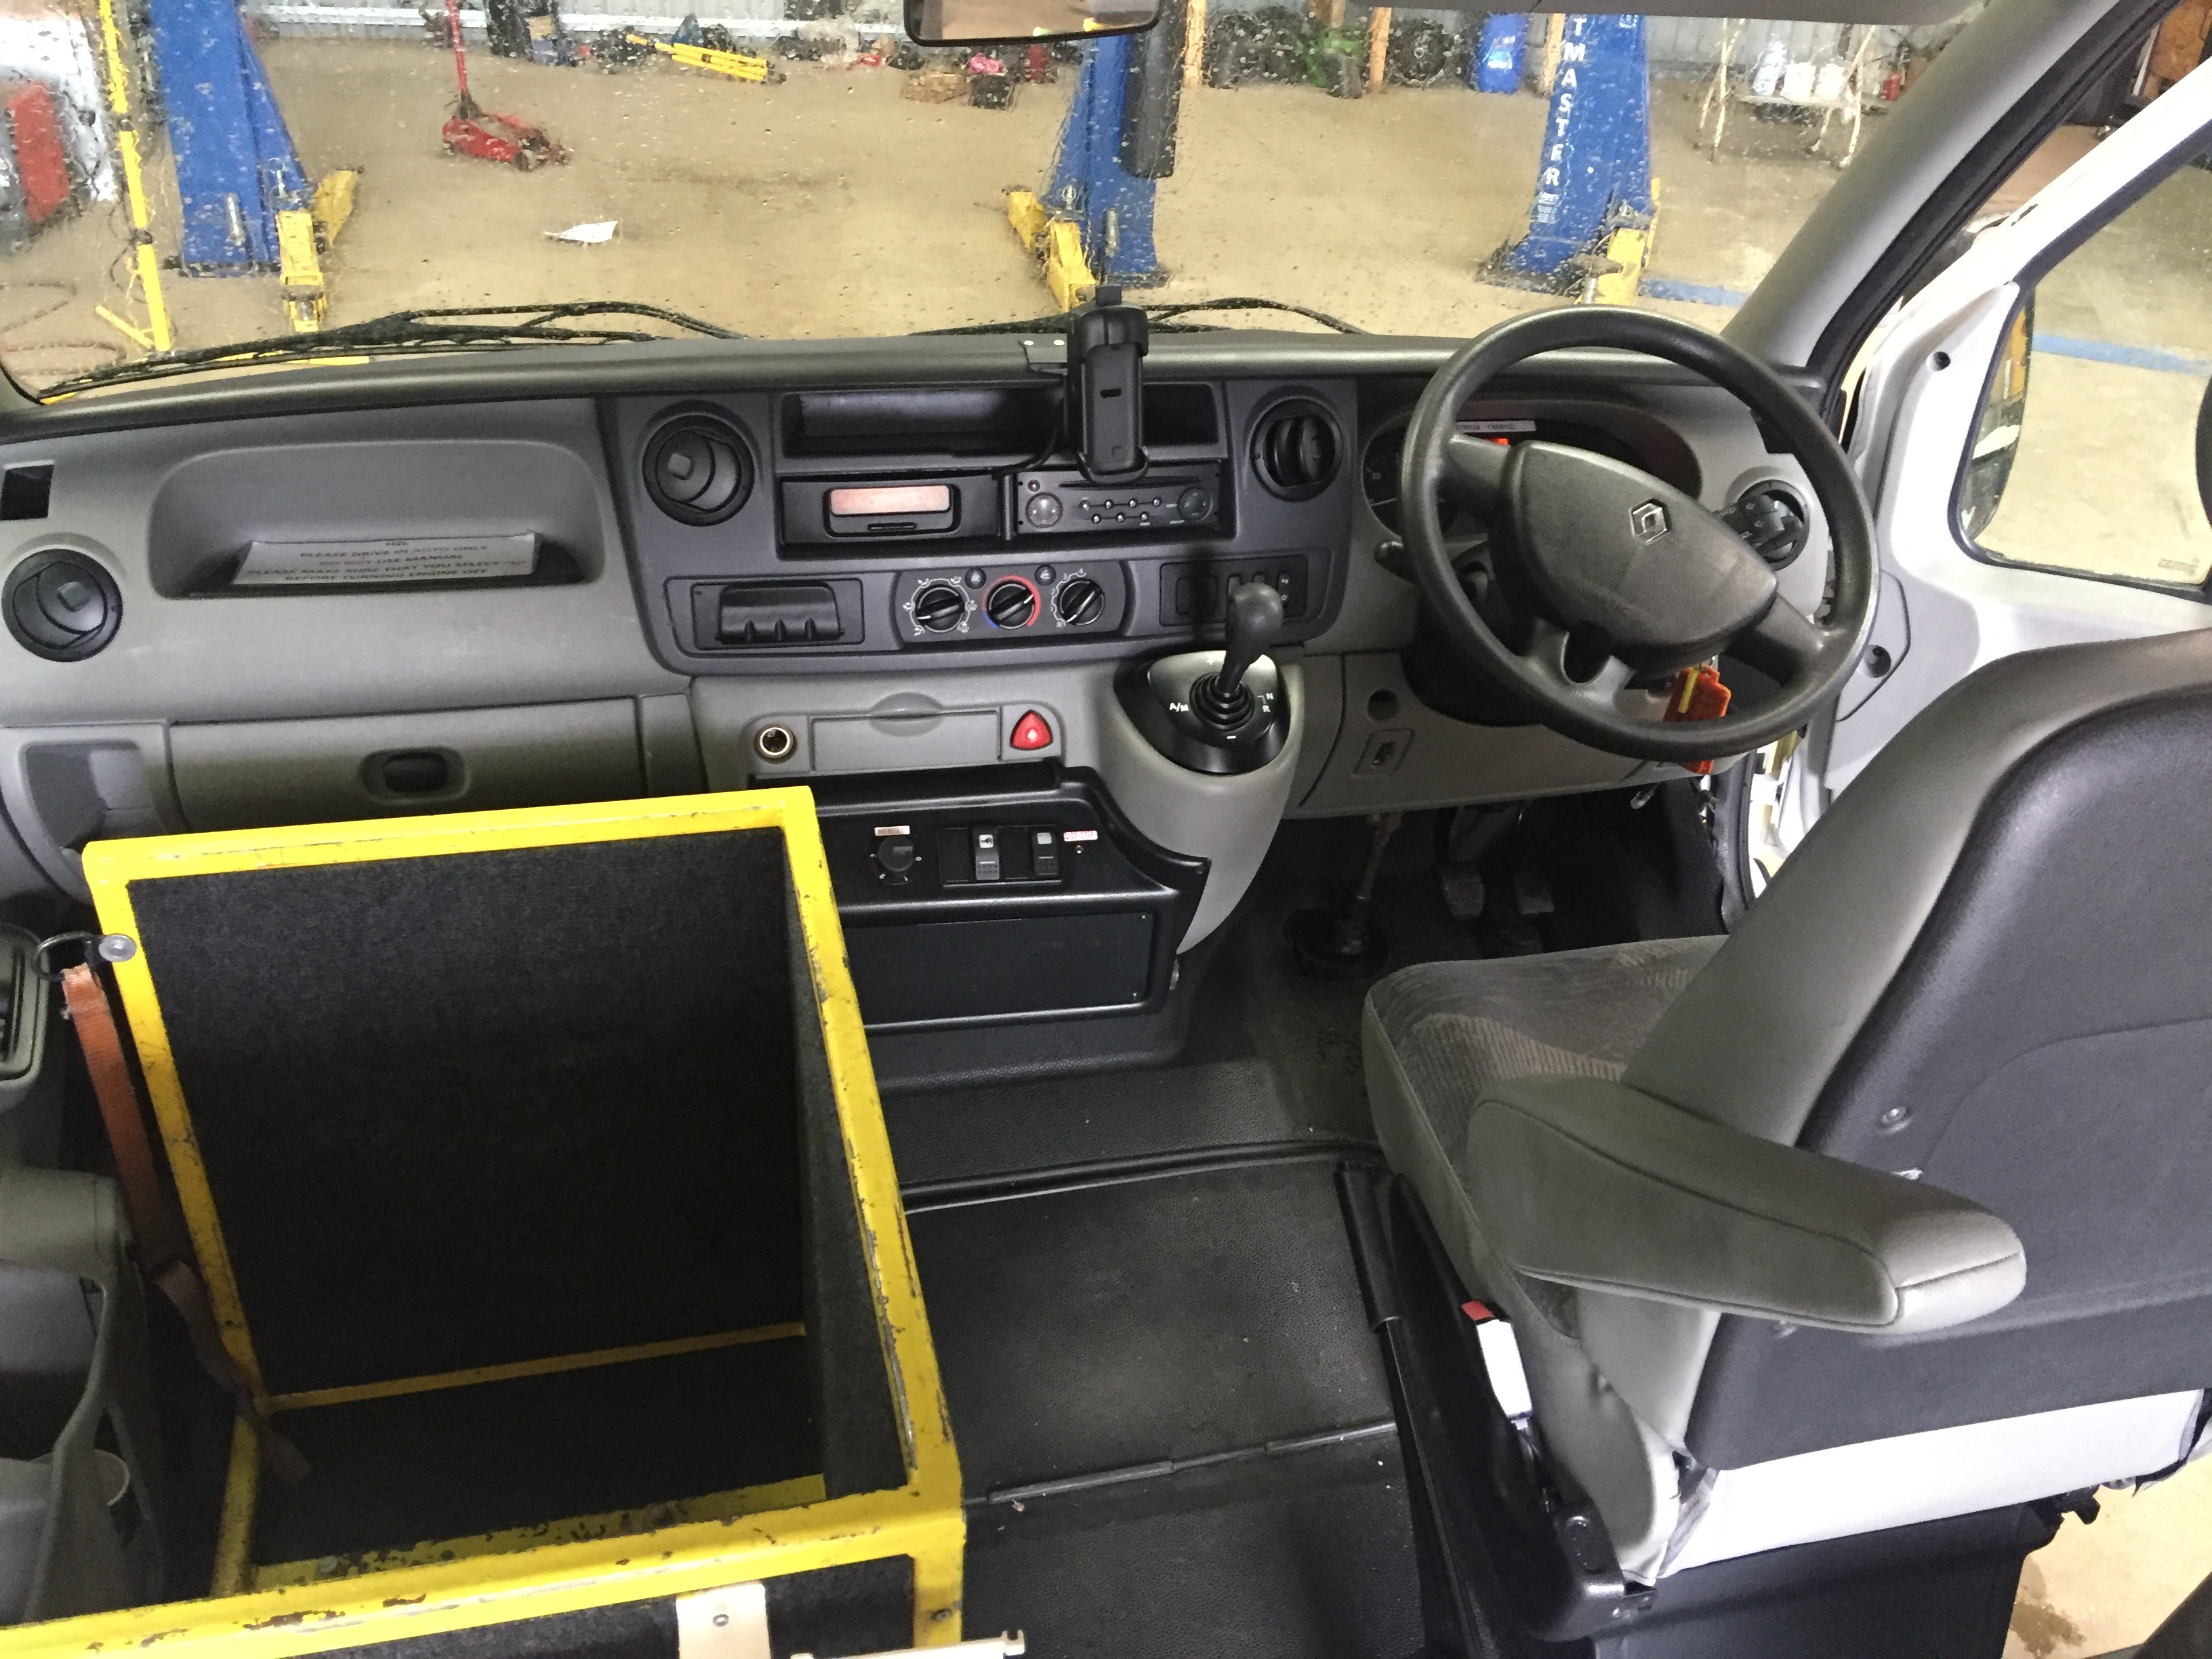 Lot 6 - Renault Master standard body patient transfer ambulance Registration No YX08 HZL, 156907 recorded